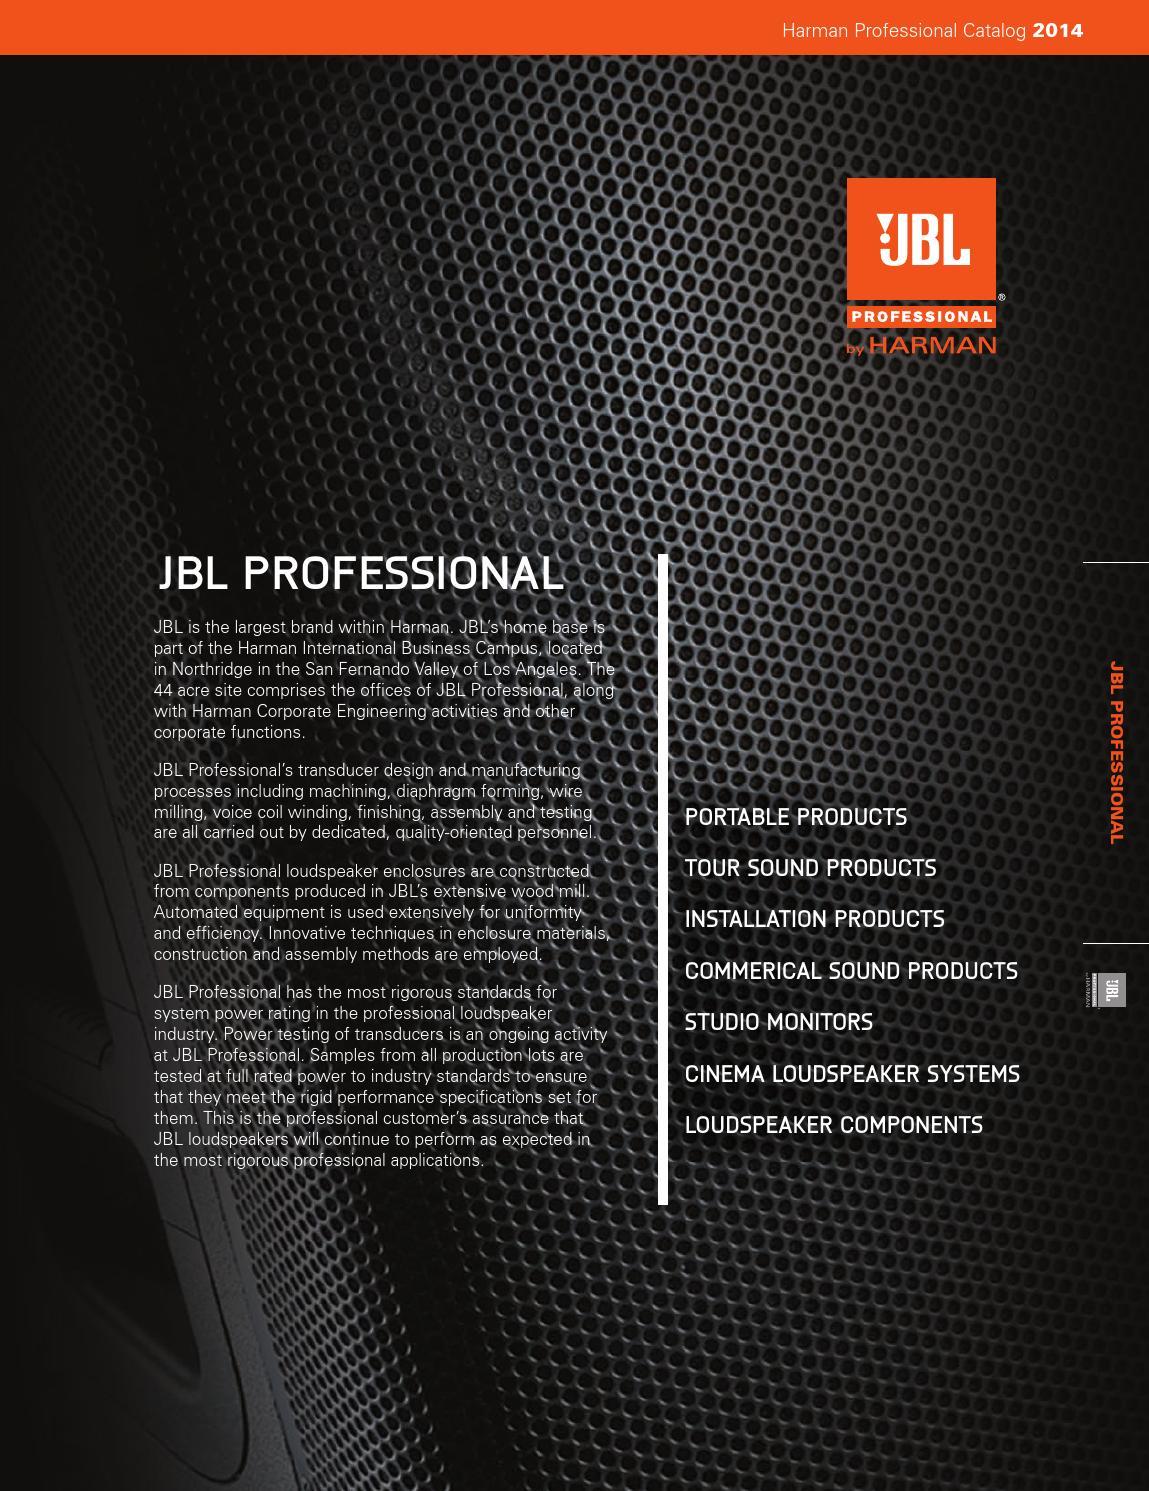 Jbl Full Catalog 2014 By Castilloarts Issuu Speaker Besides Srx Subwoofer Speakers On Wiring With